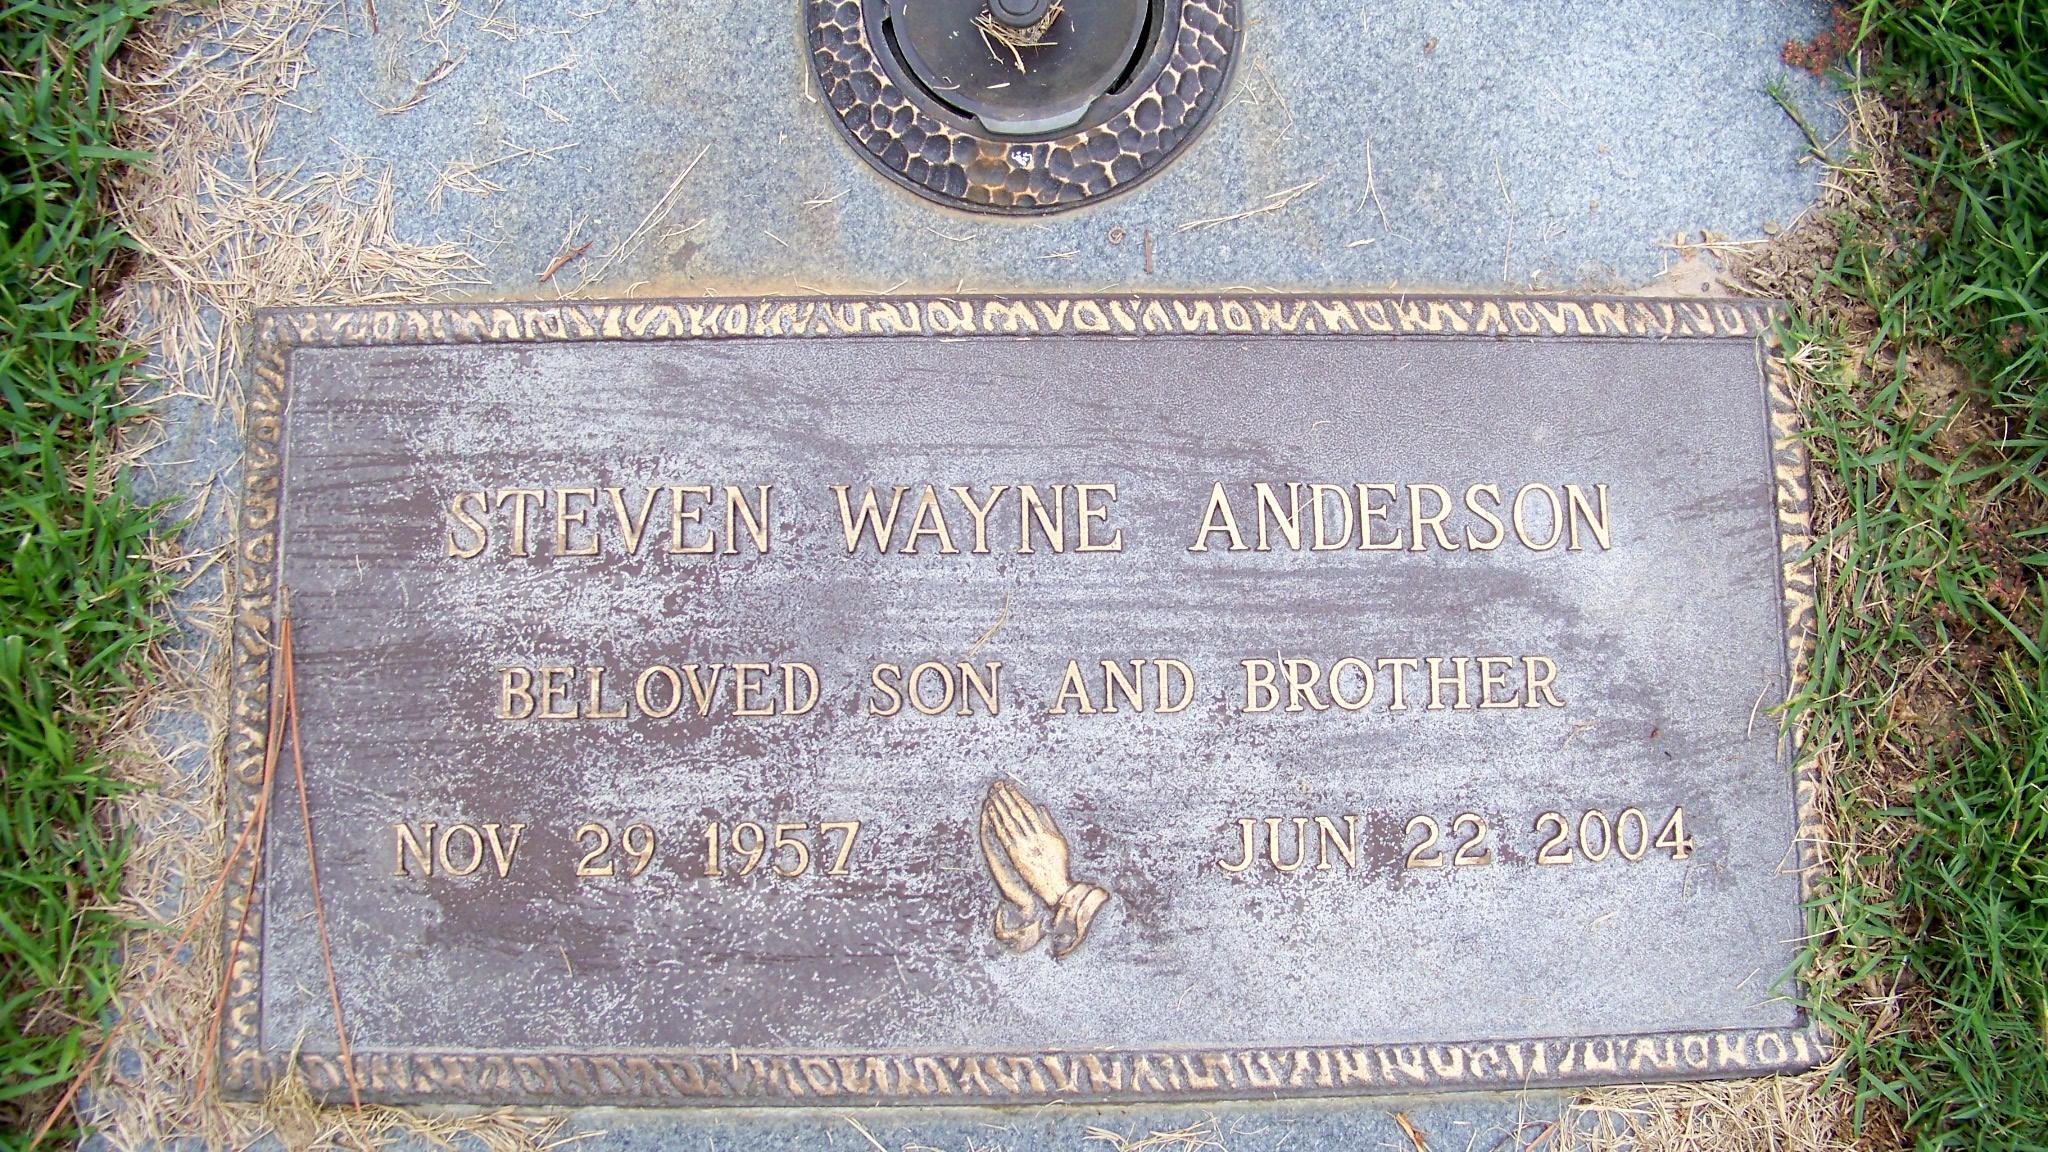 Steven Wayne Anderson